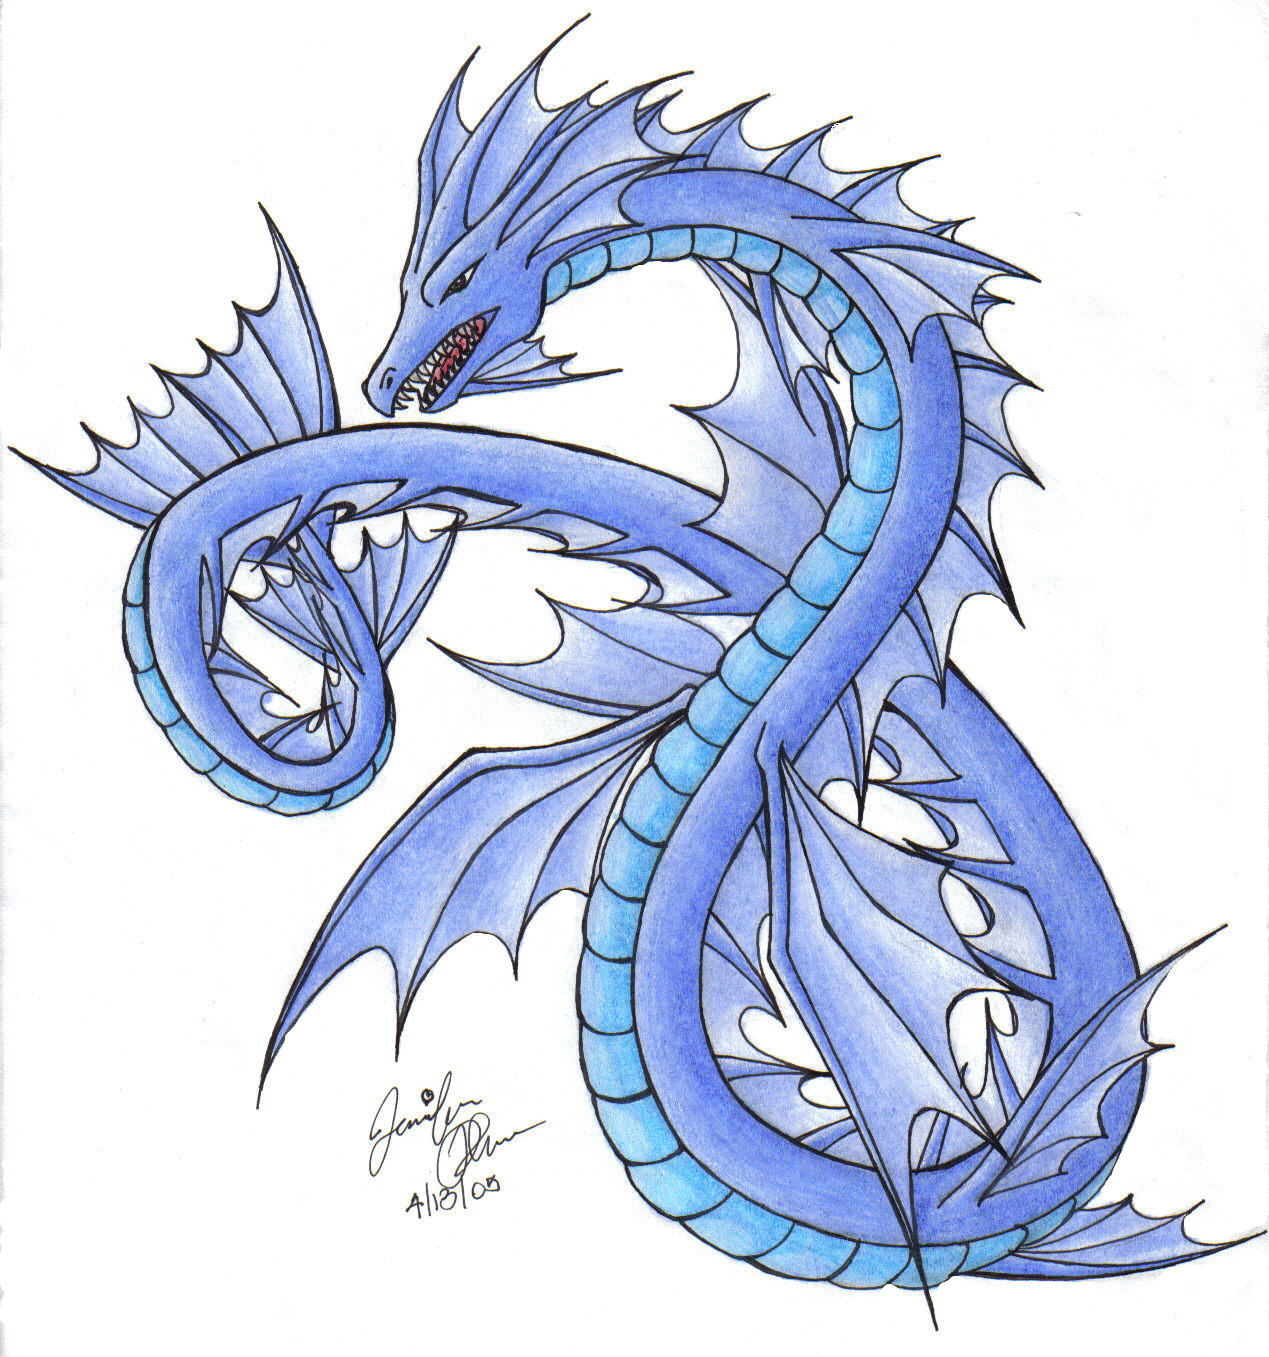 Water Dragon by SkyEmerald on DeviantArt